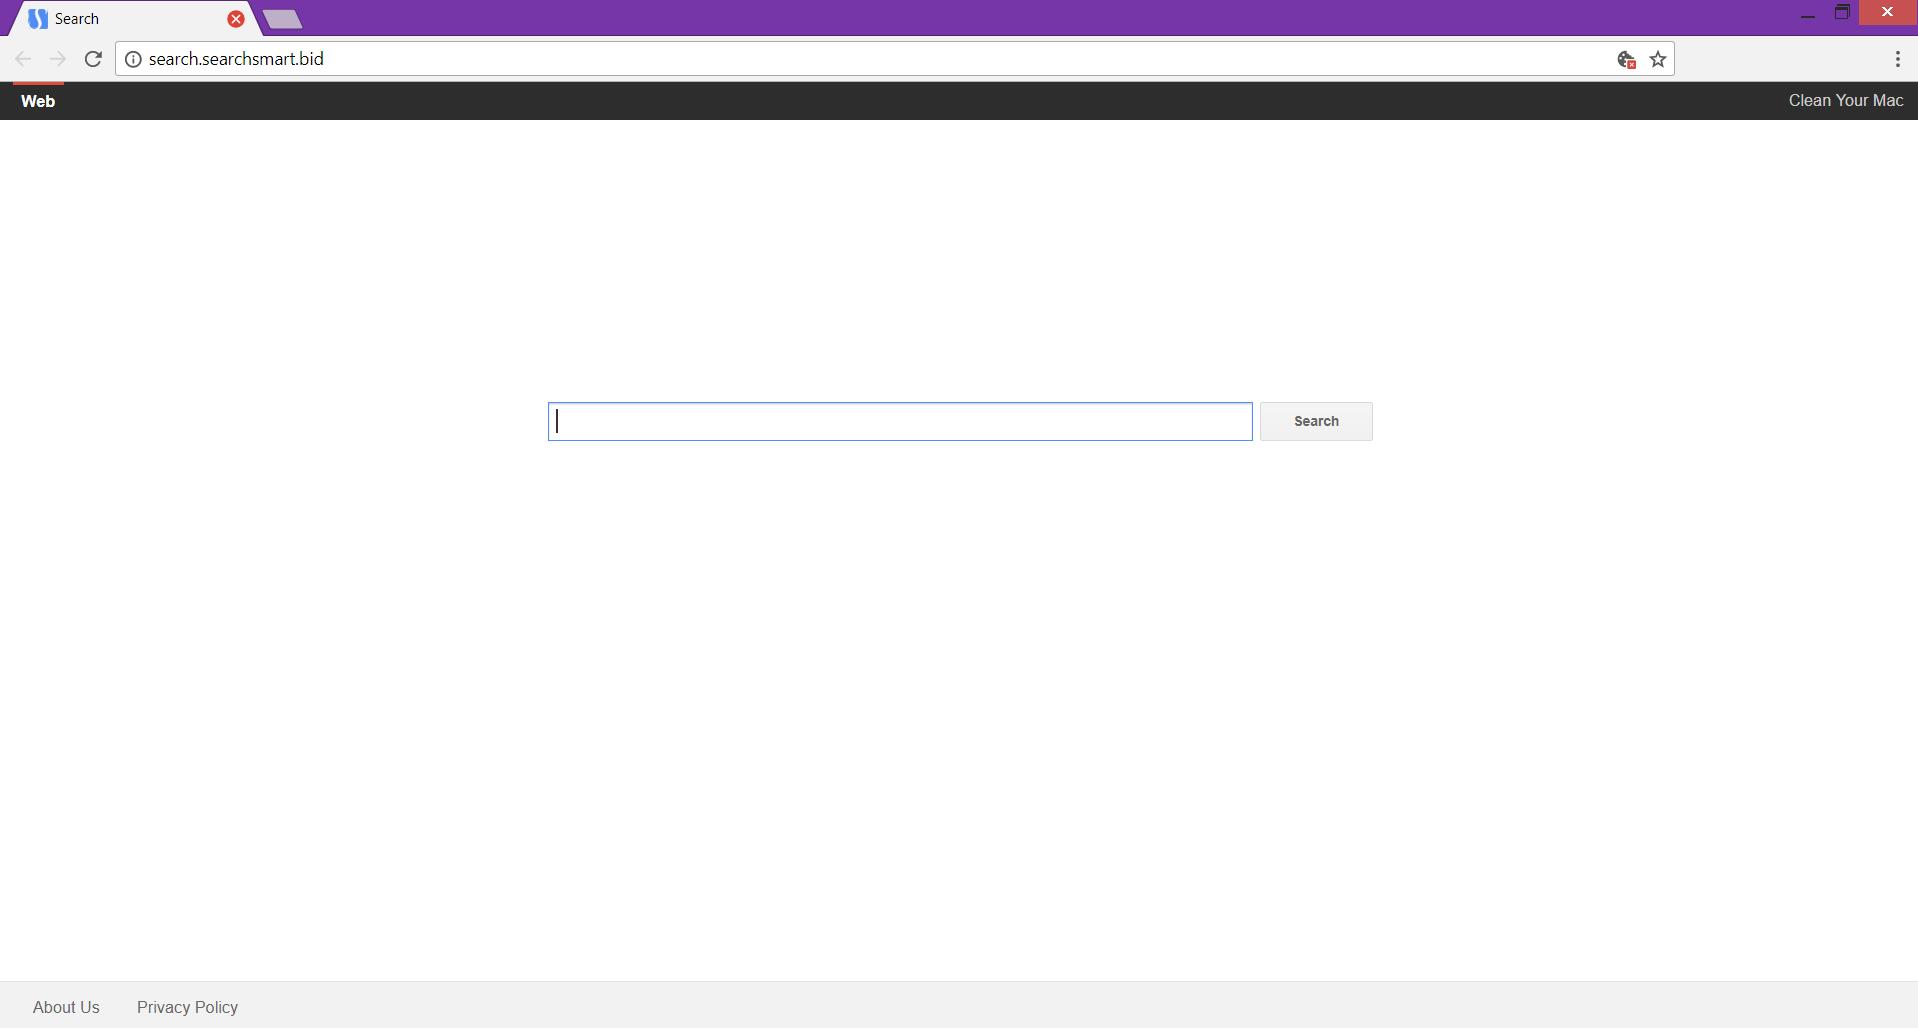 Search.searchsmart.bid redirect main page